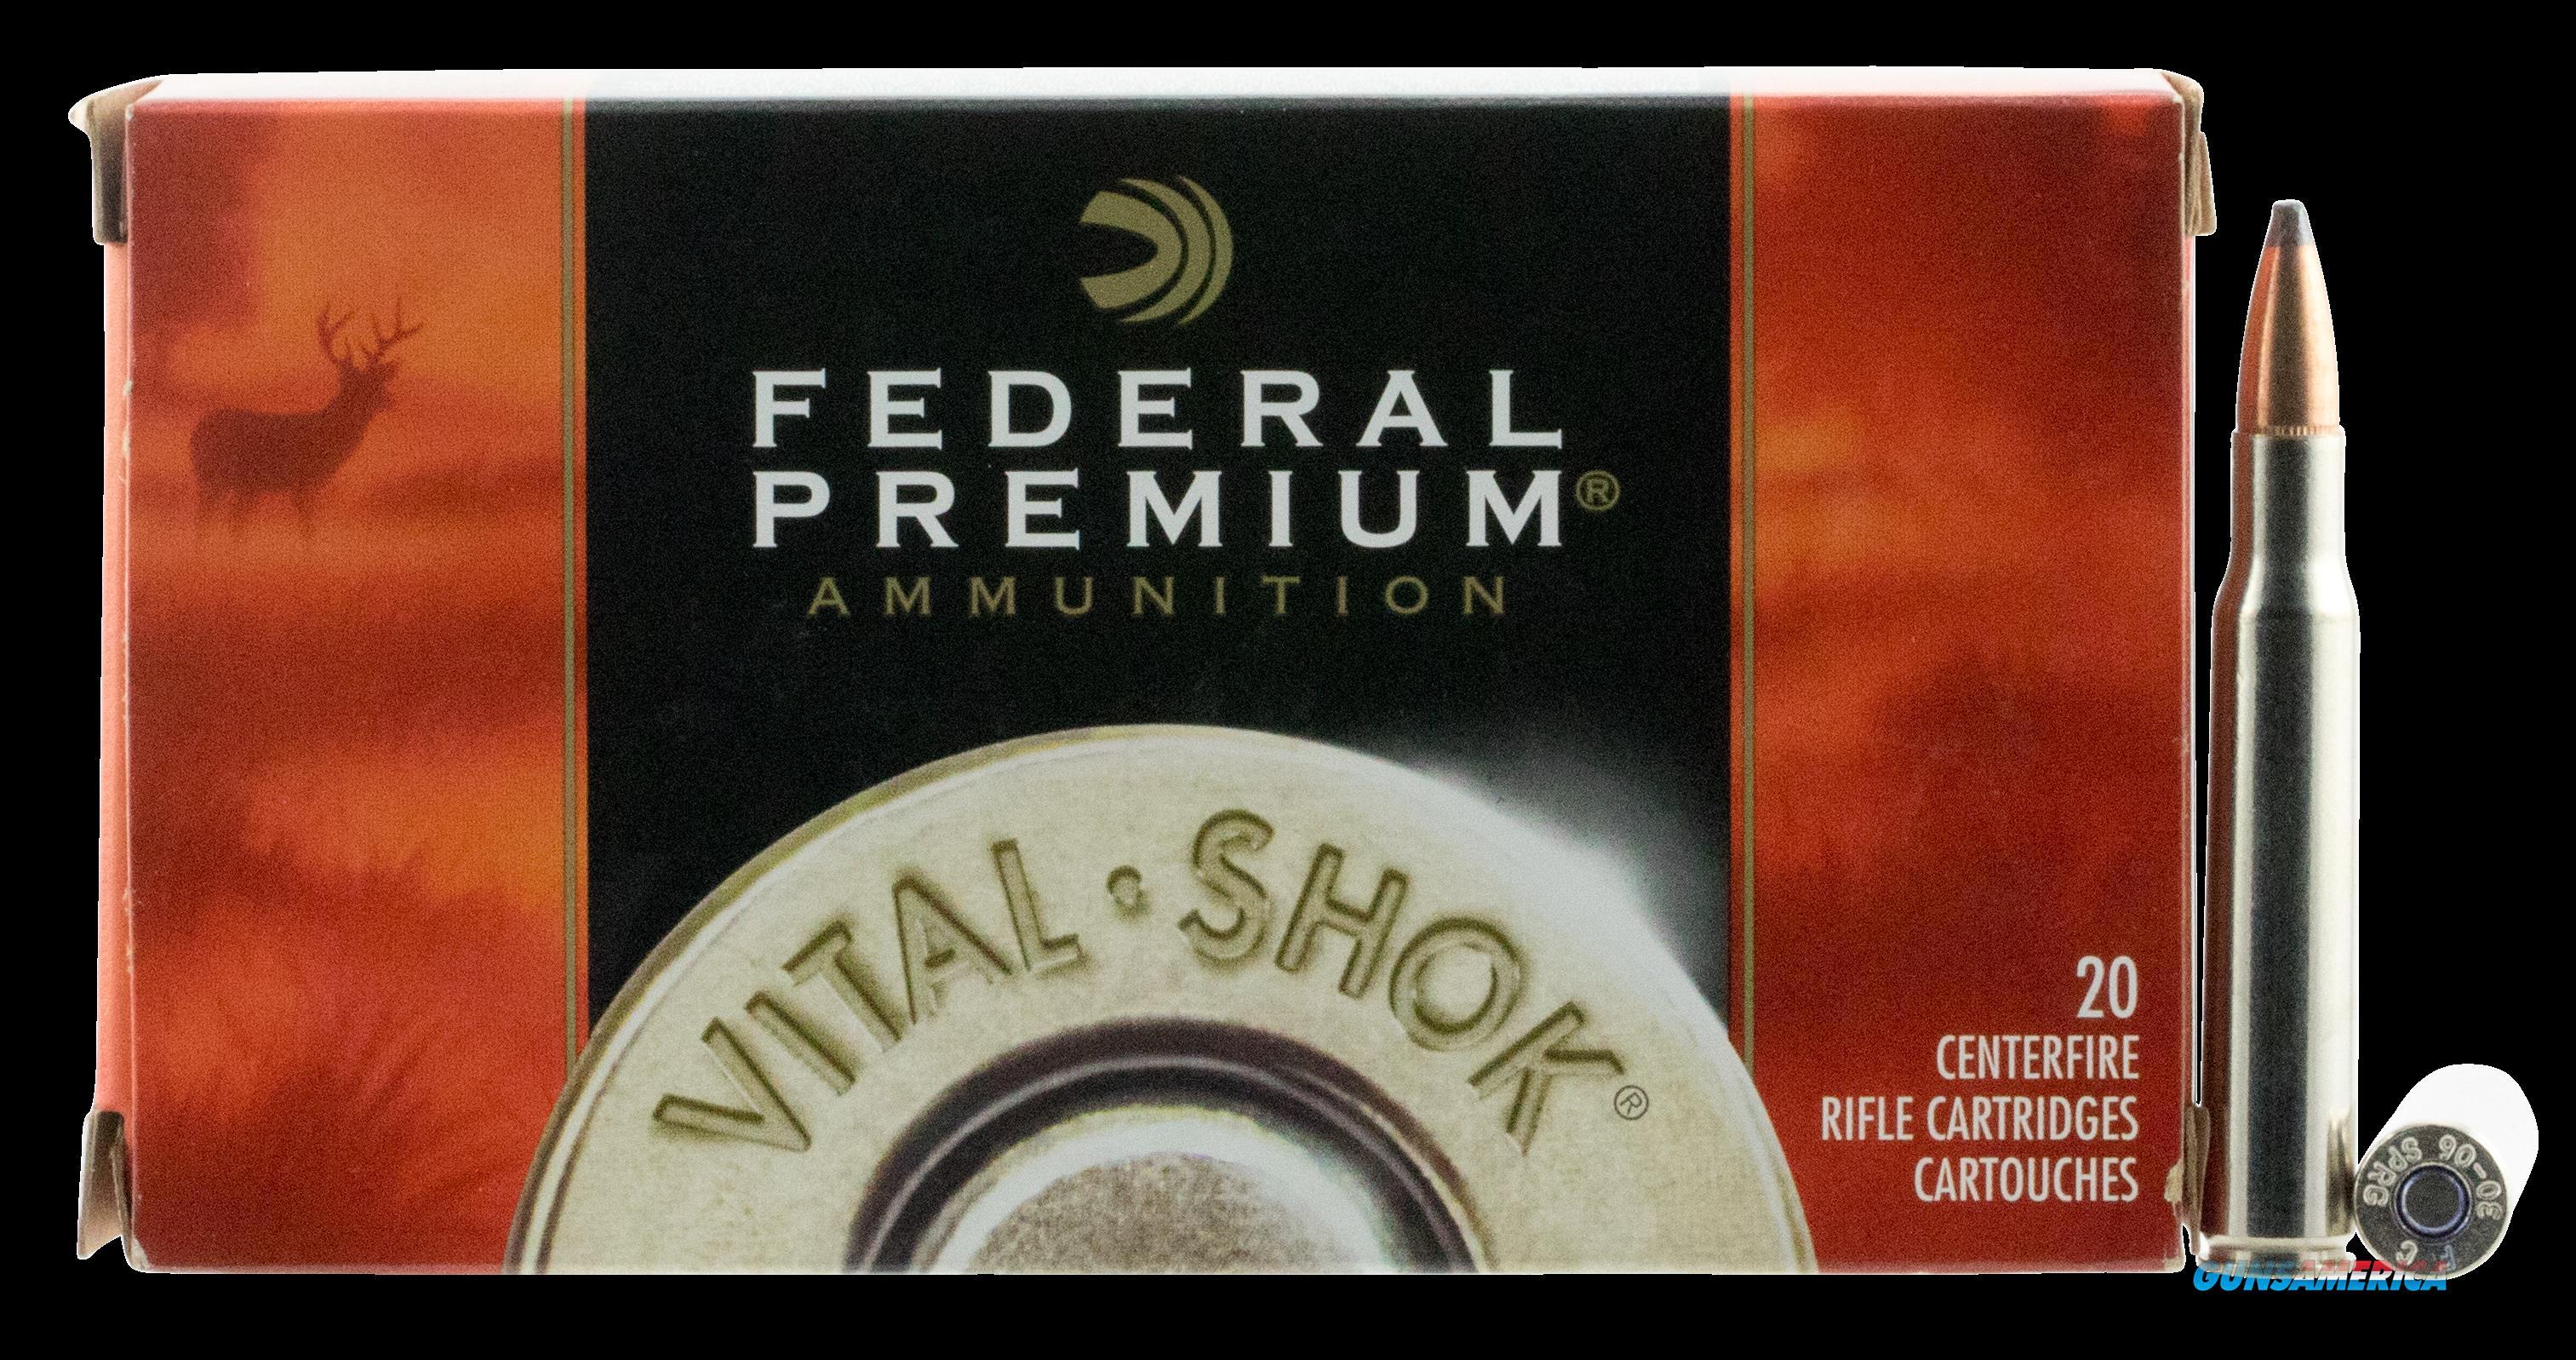 Federal Premium, Fed P3006g     3006   150 Btsp           20-10  Guns > Pistols > 1911 Pistol Copies (non-Colt)